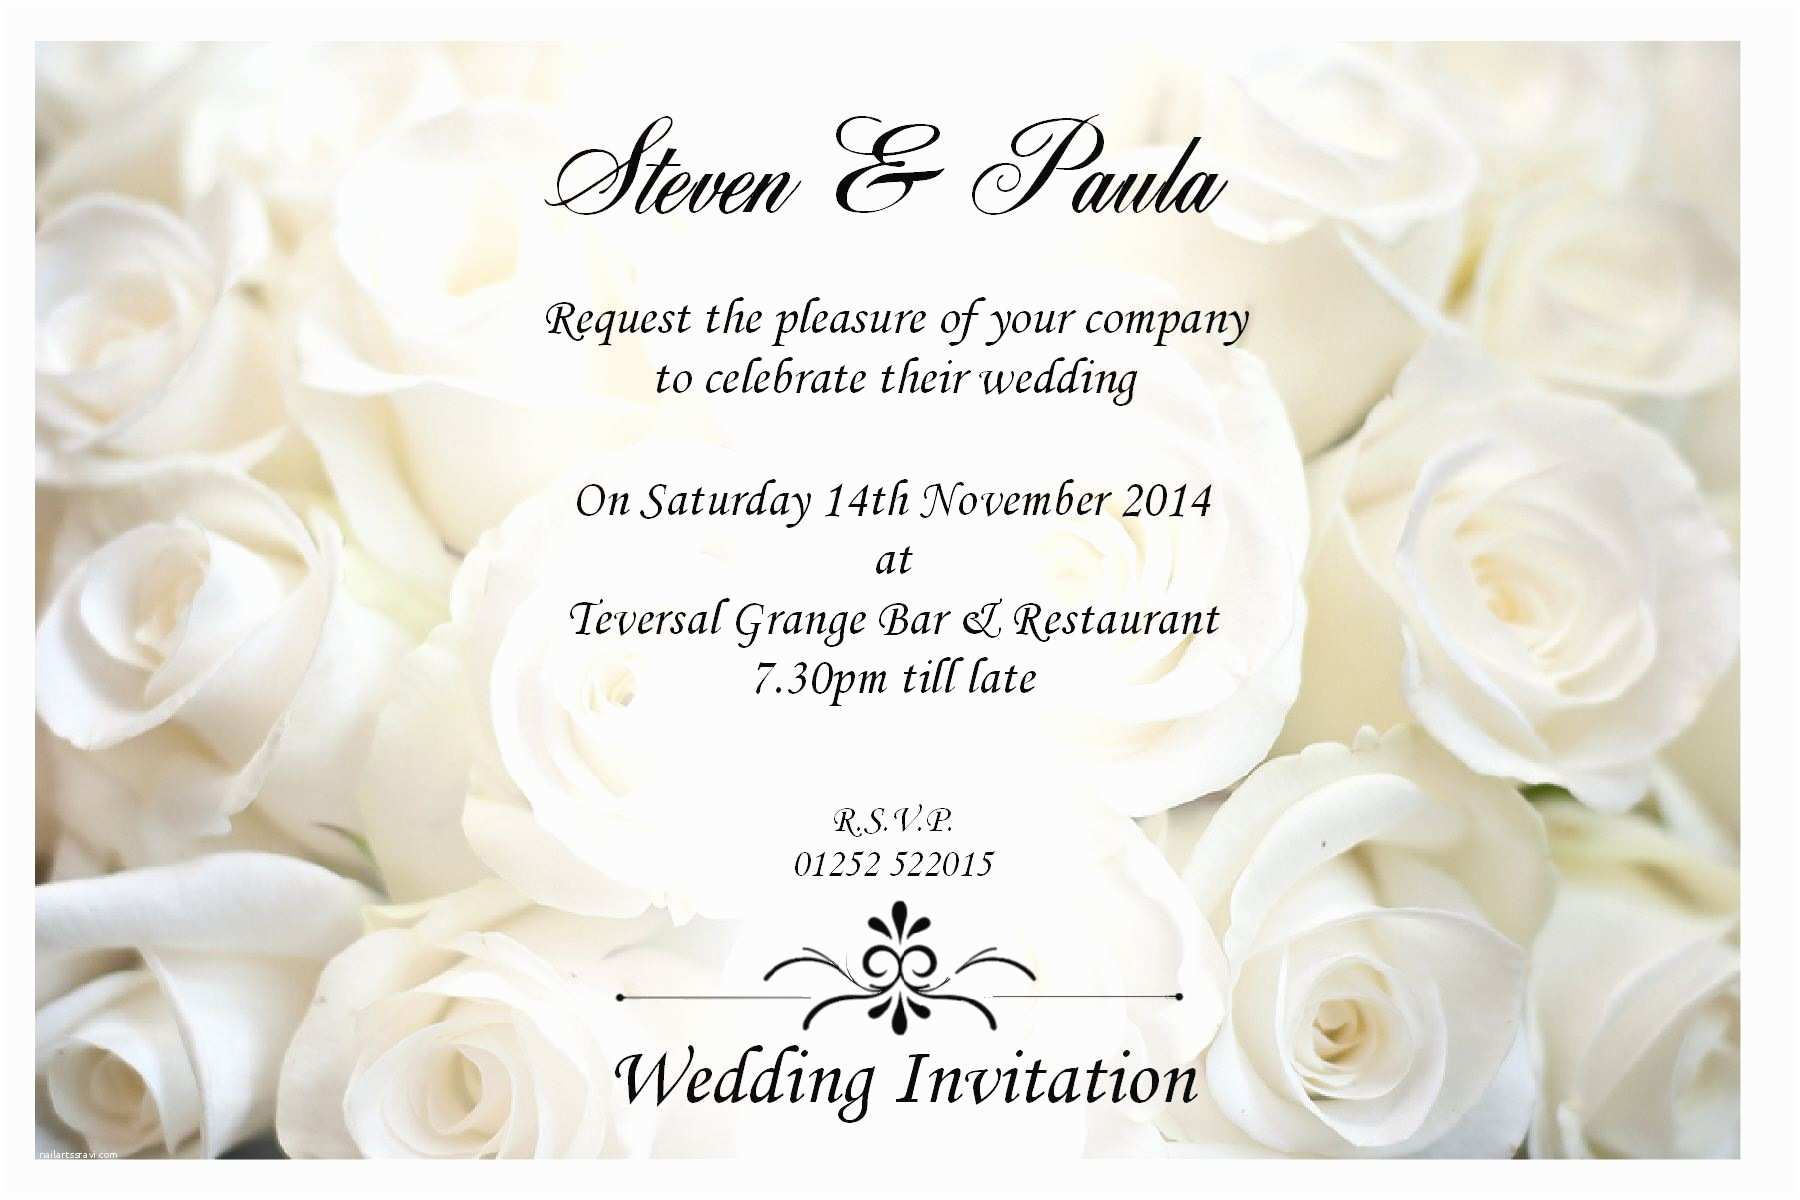 Samples Of Wedding Invitations Wedding Invitation Sample Wedding Invitation Card New